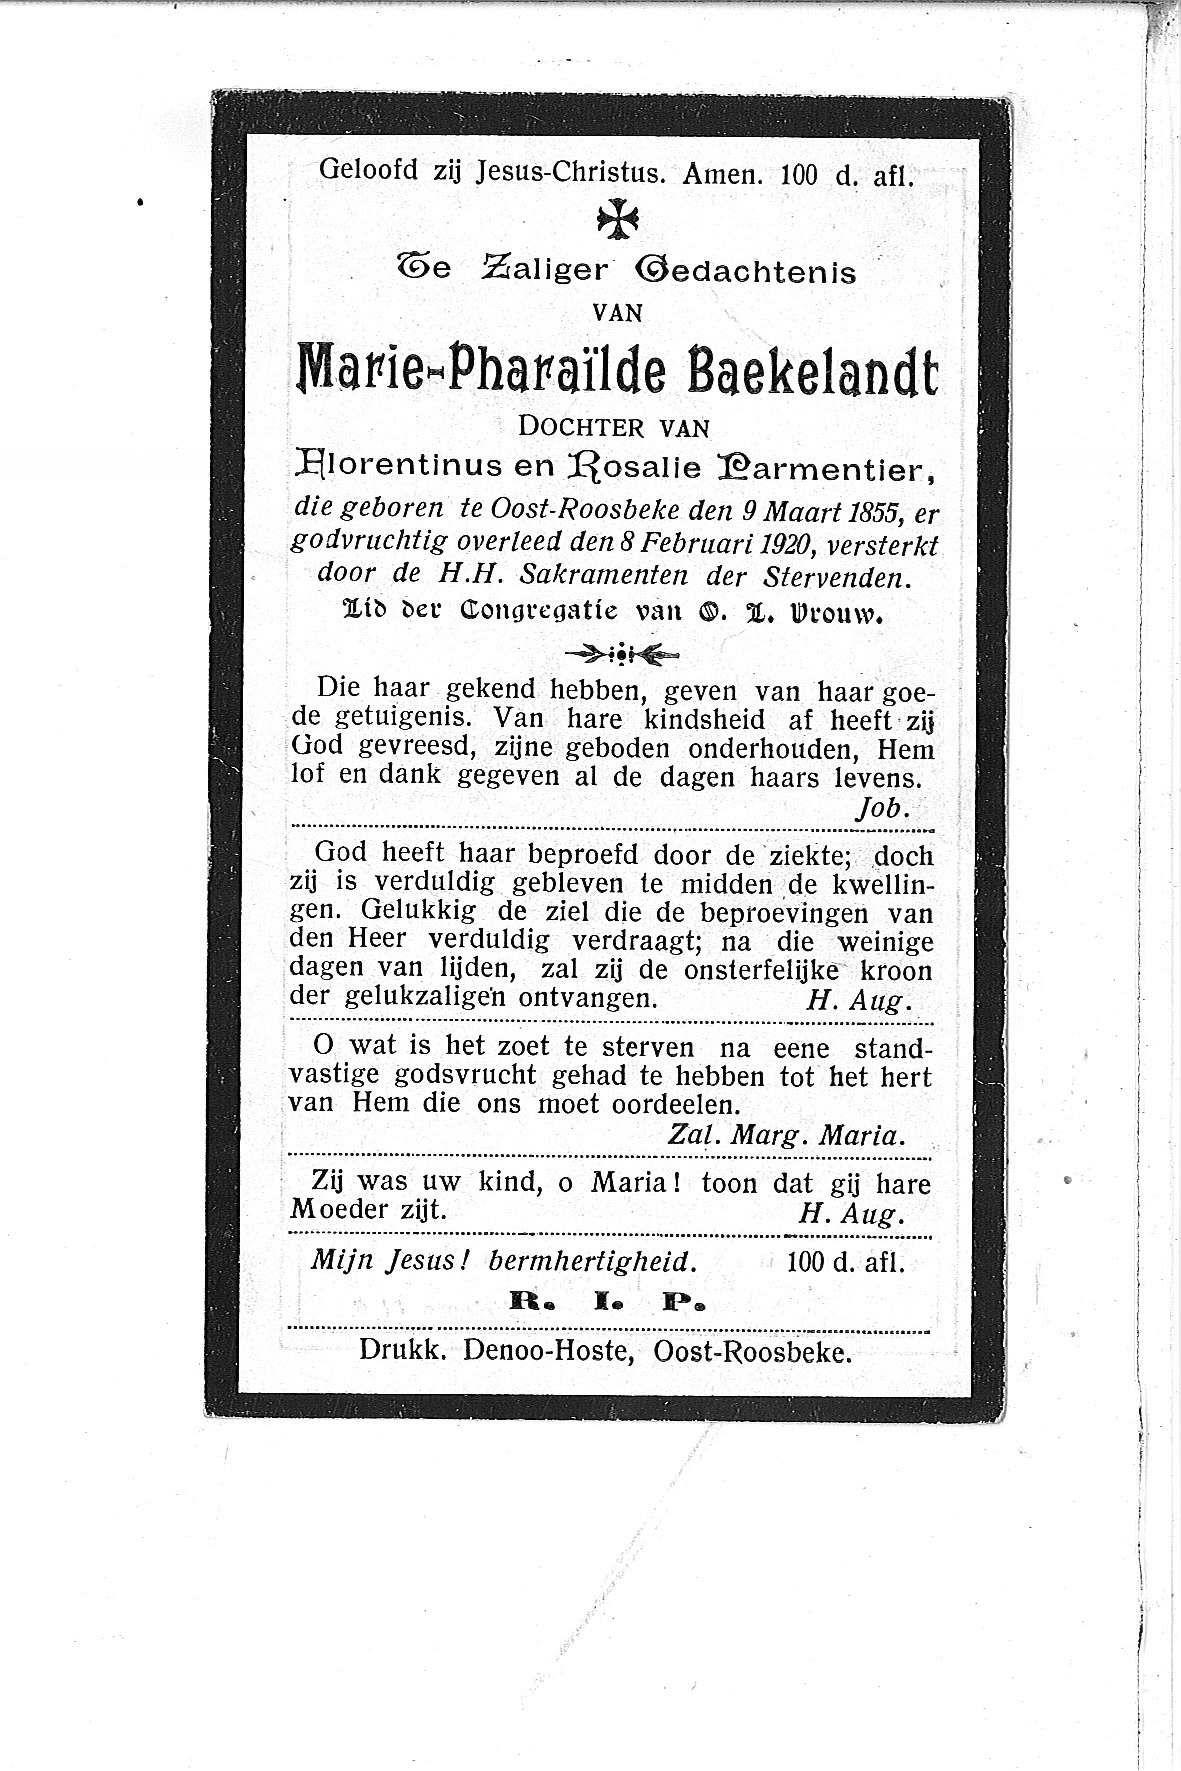 Marie-Pharaïlde(1920)20100927140114_00014.jpg